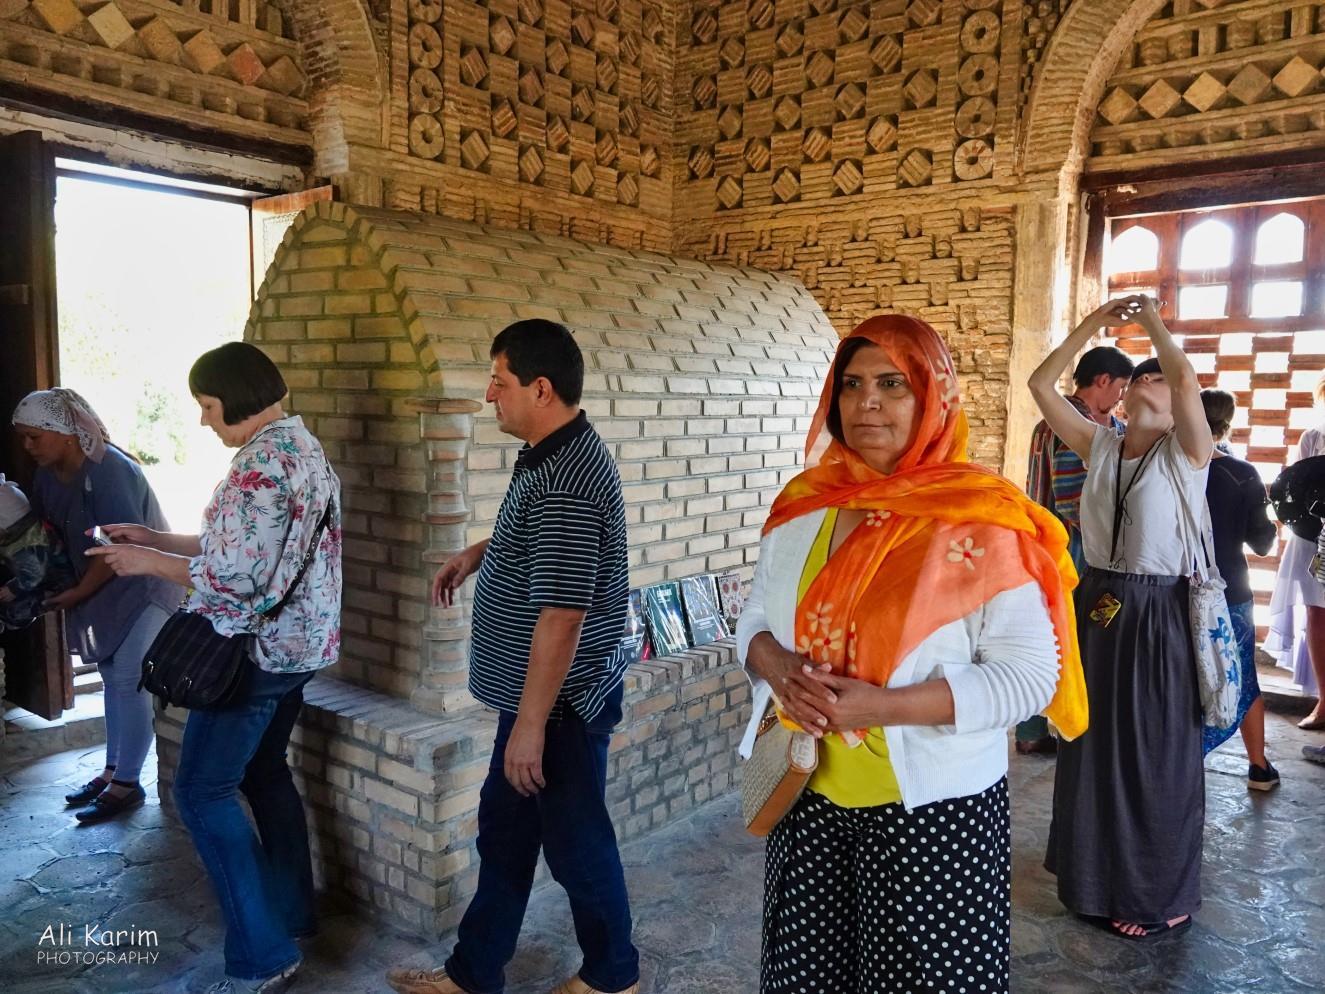 Bukhara, Oct 2019, Simple tomb inside the mausoleum of Ismoil Somoni; note the brickwork inside